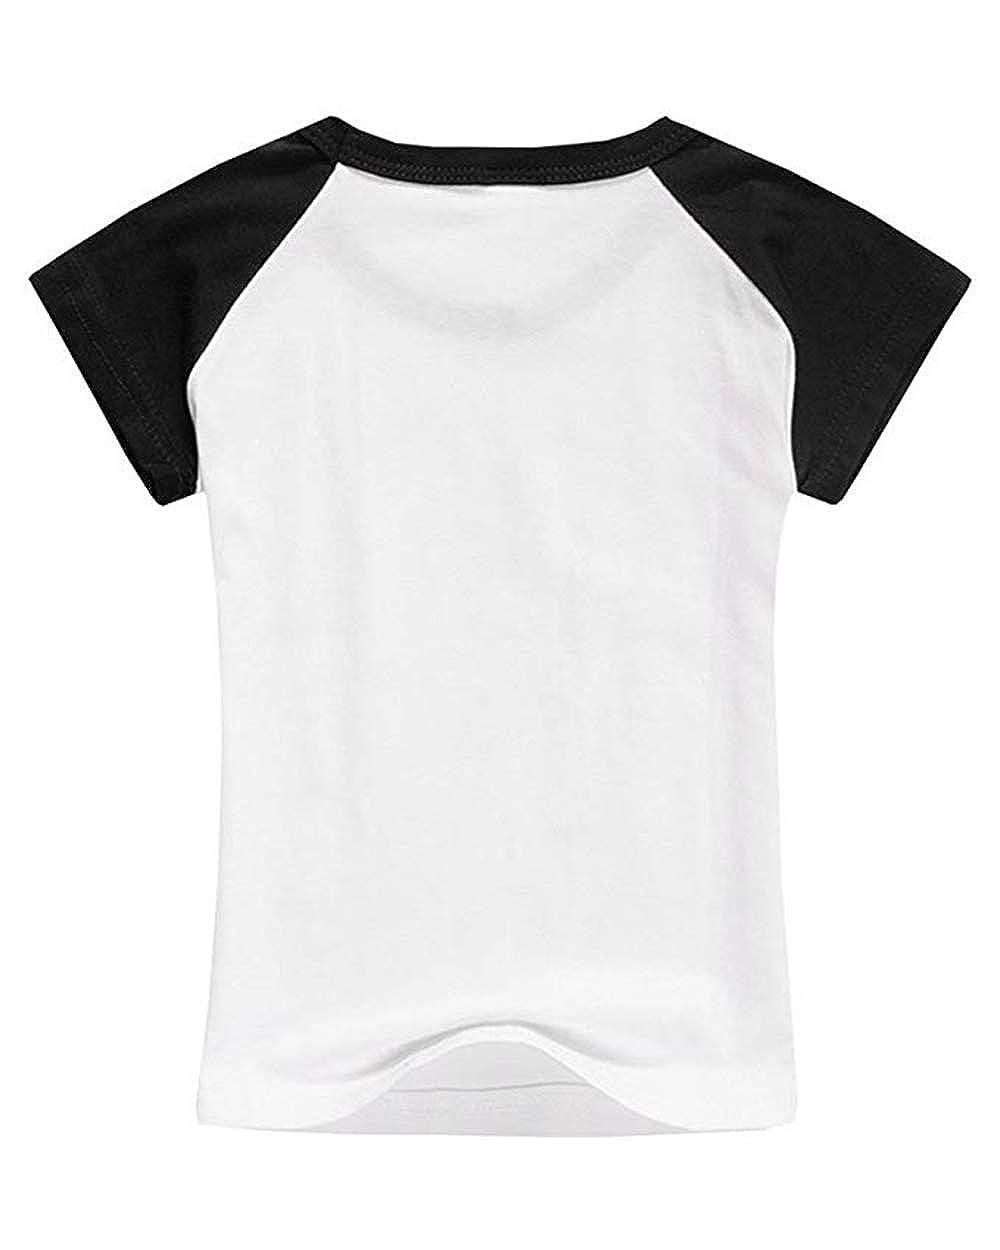 Xuforget Broad City Womens School Short Sleeve Baseball T Shirts